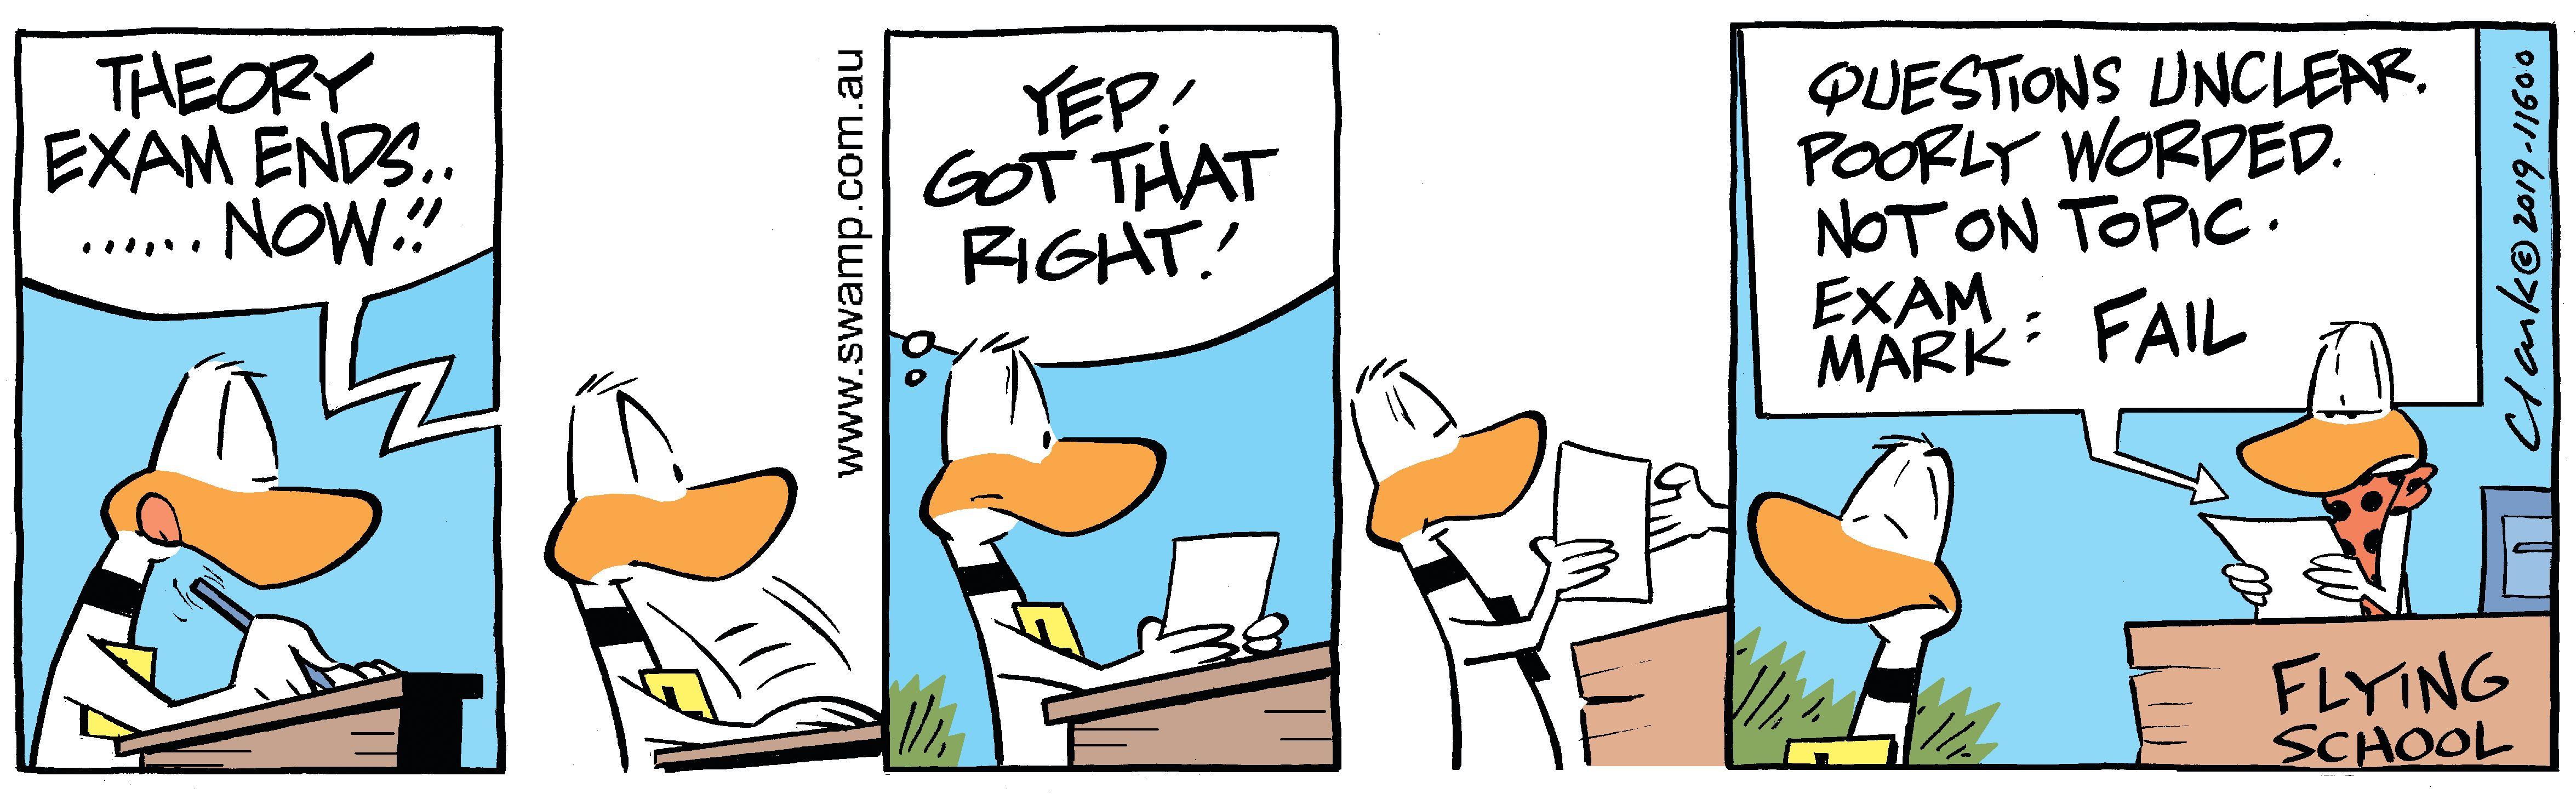 Ding Duck Exam Assessment Comic   Swamp Cartoons